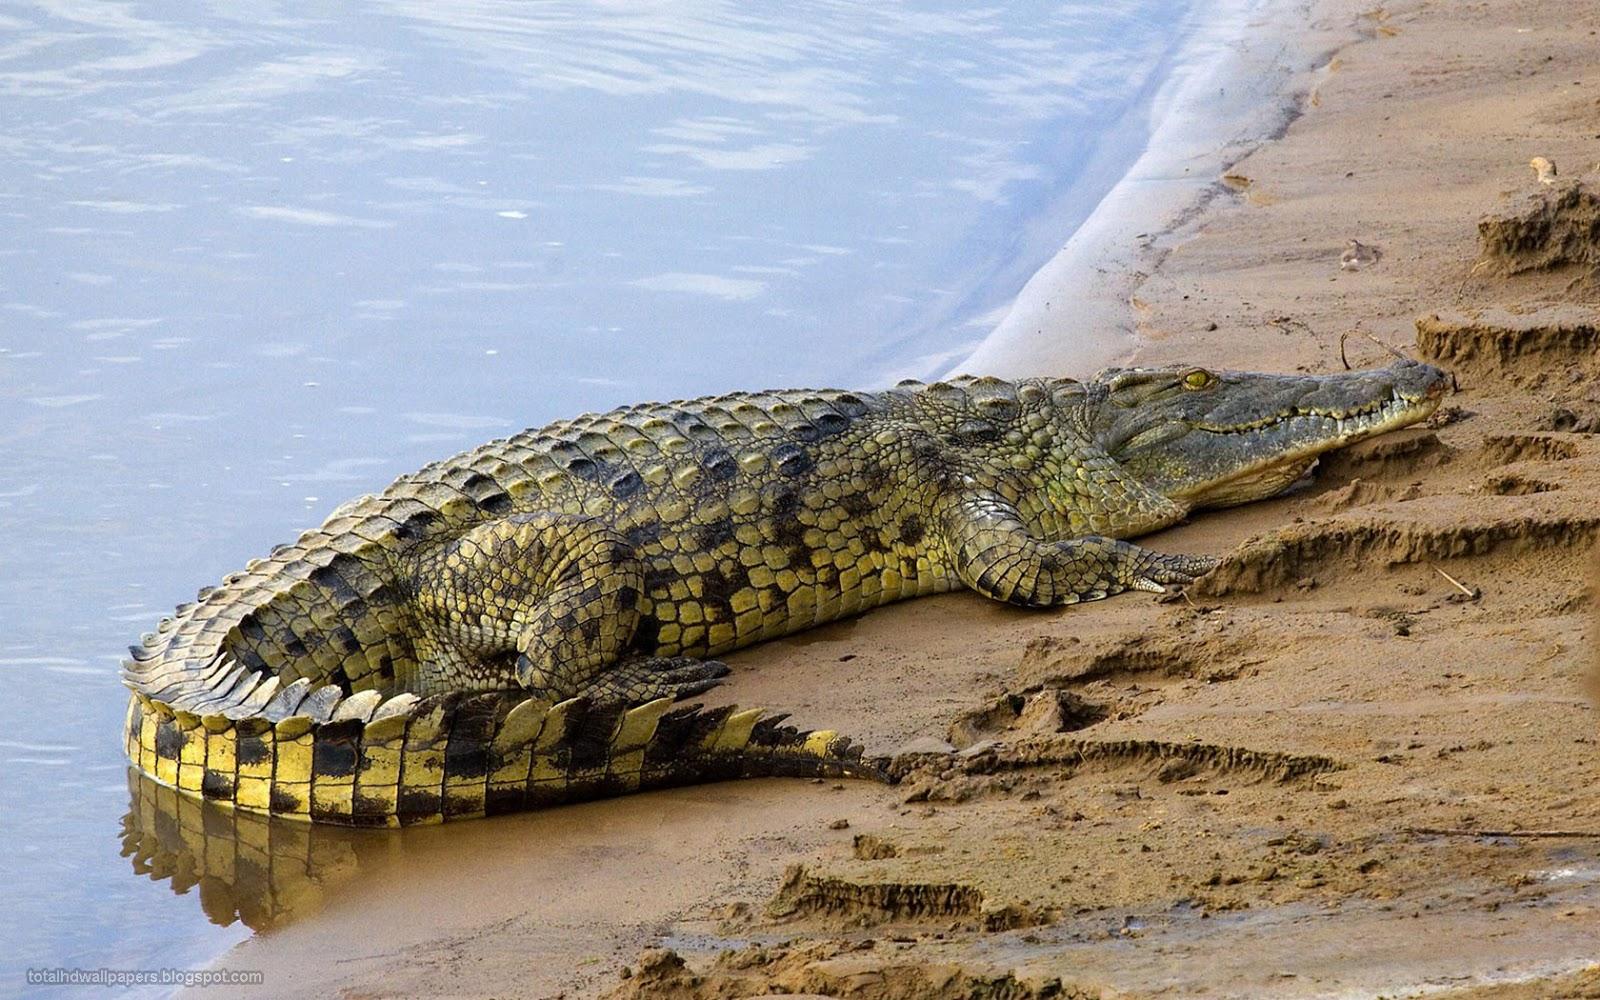 Crocodile Wallpapers hd   Neptunes Dreams